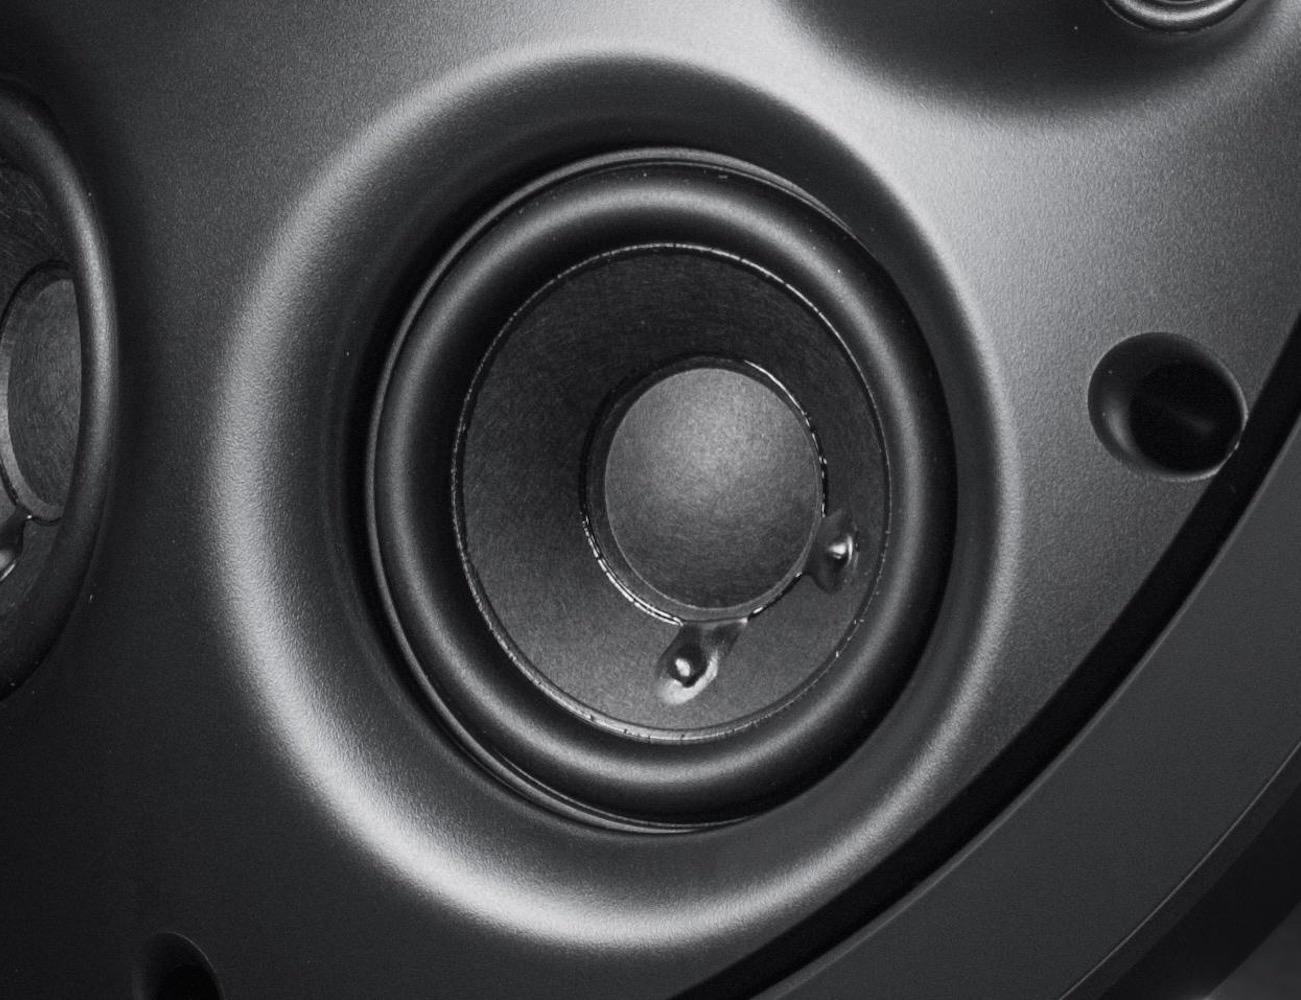 Onyx Studio Portable Wireless Bluetooth Speaker by Harman Kardon